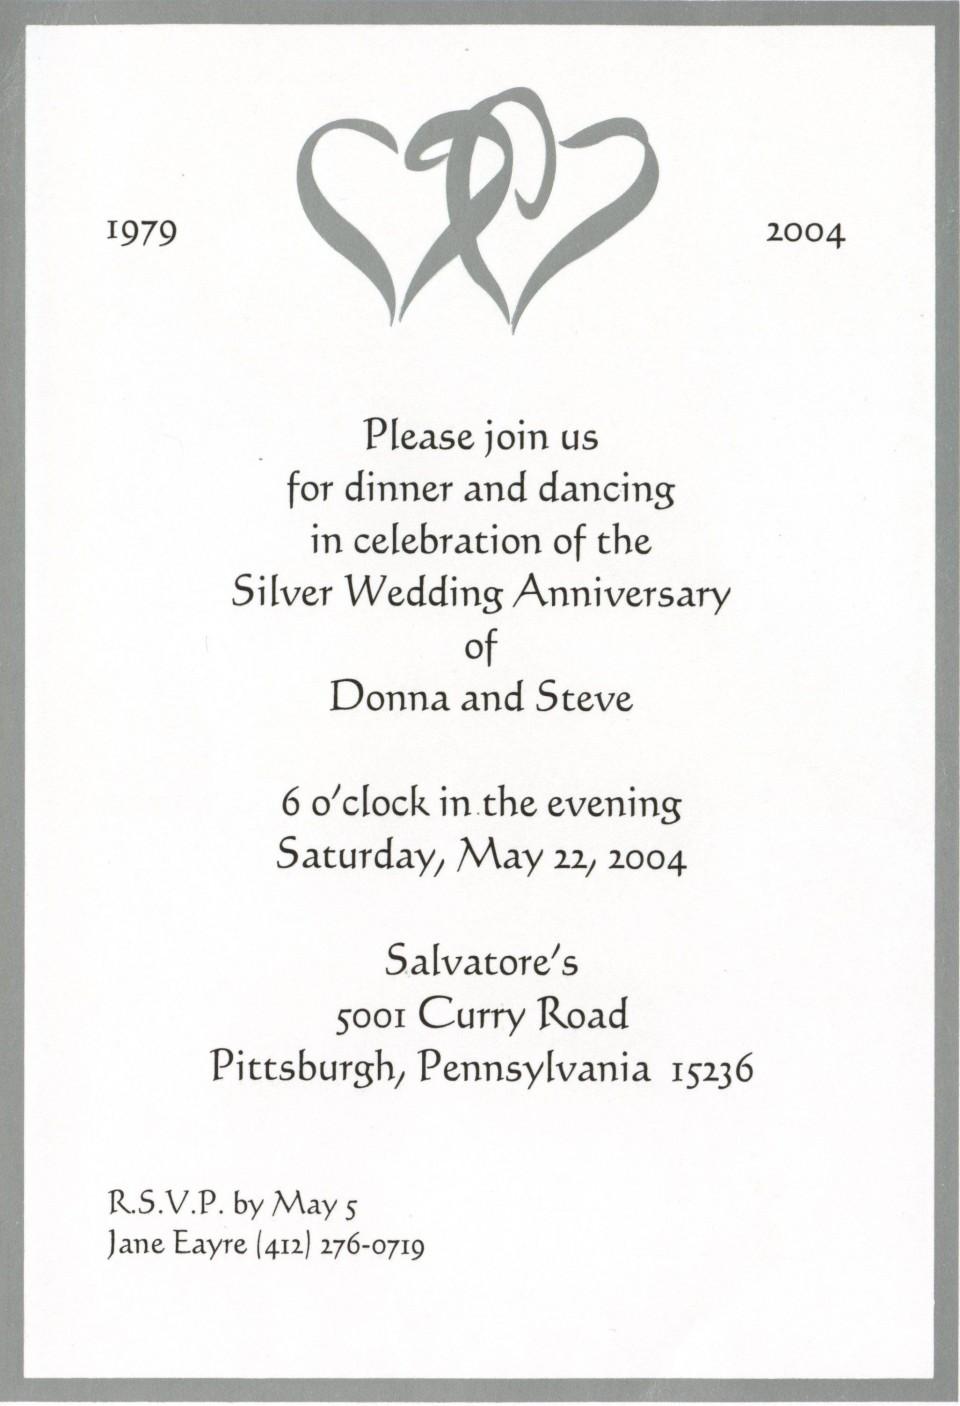 007 Unusual 50th Anniversary Invitation Template Image  Wedding Microsoft Word Free Download960